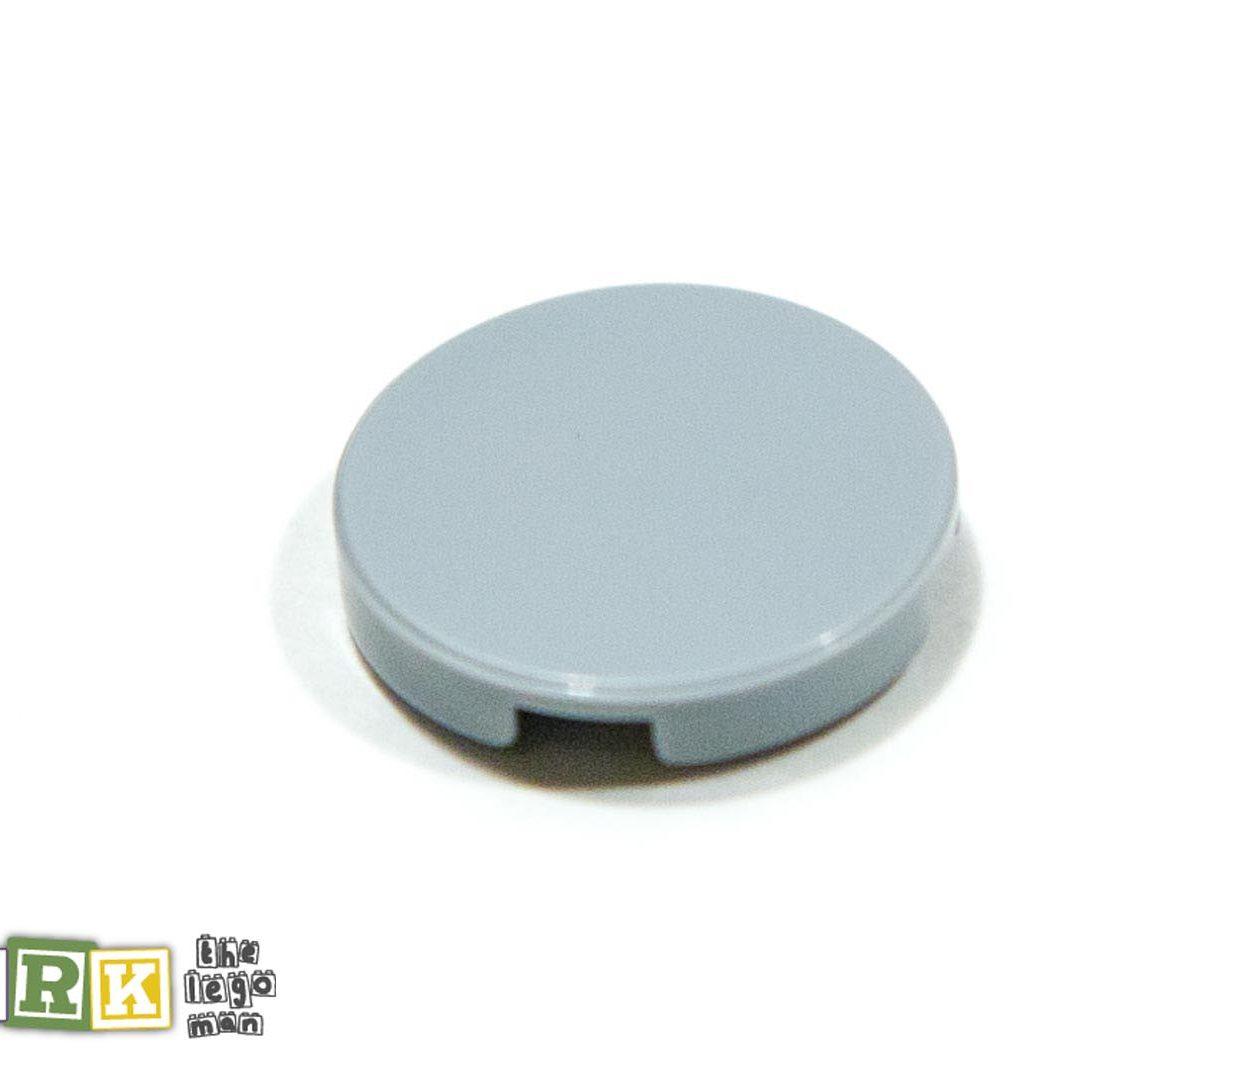 Lego 6052200 14769 1x Light Blueish Grey Md Stone Medium Standard Grey 2x2 Round Flat Tile